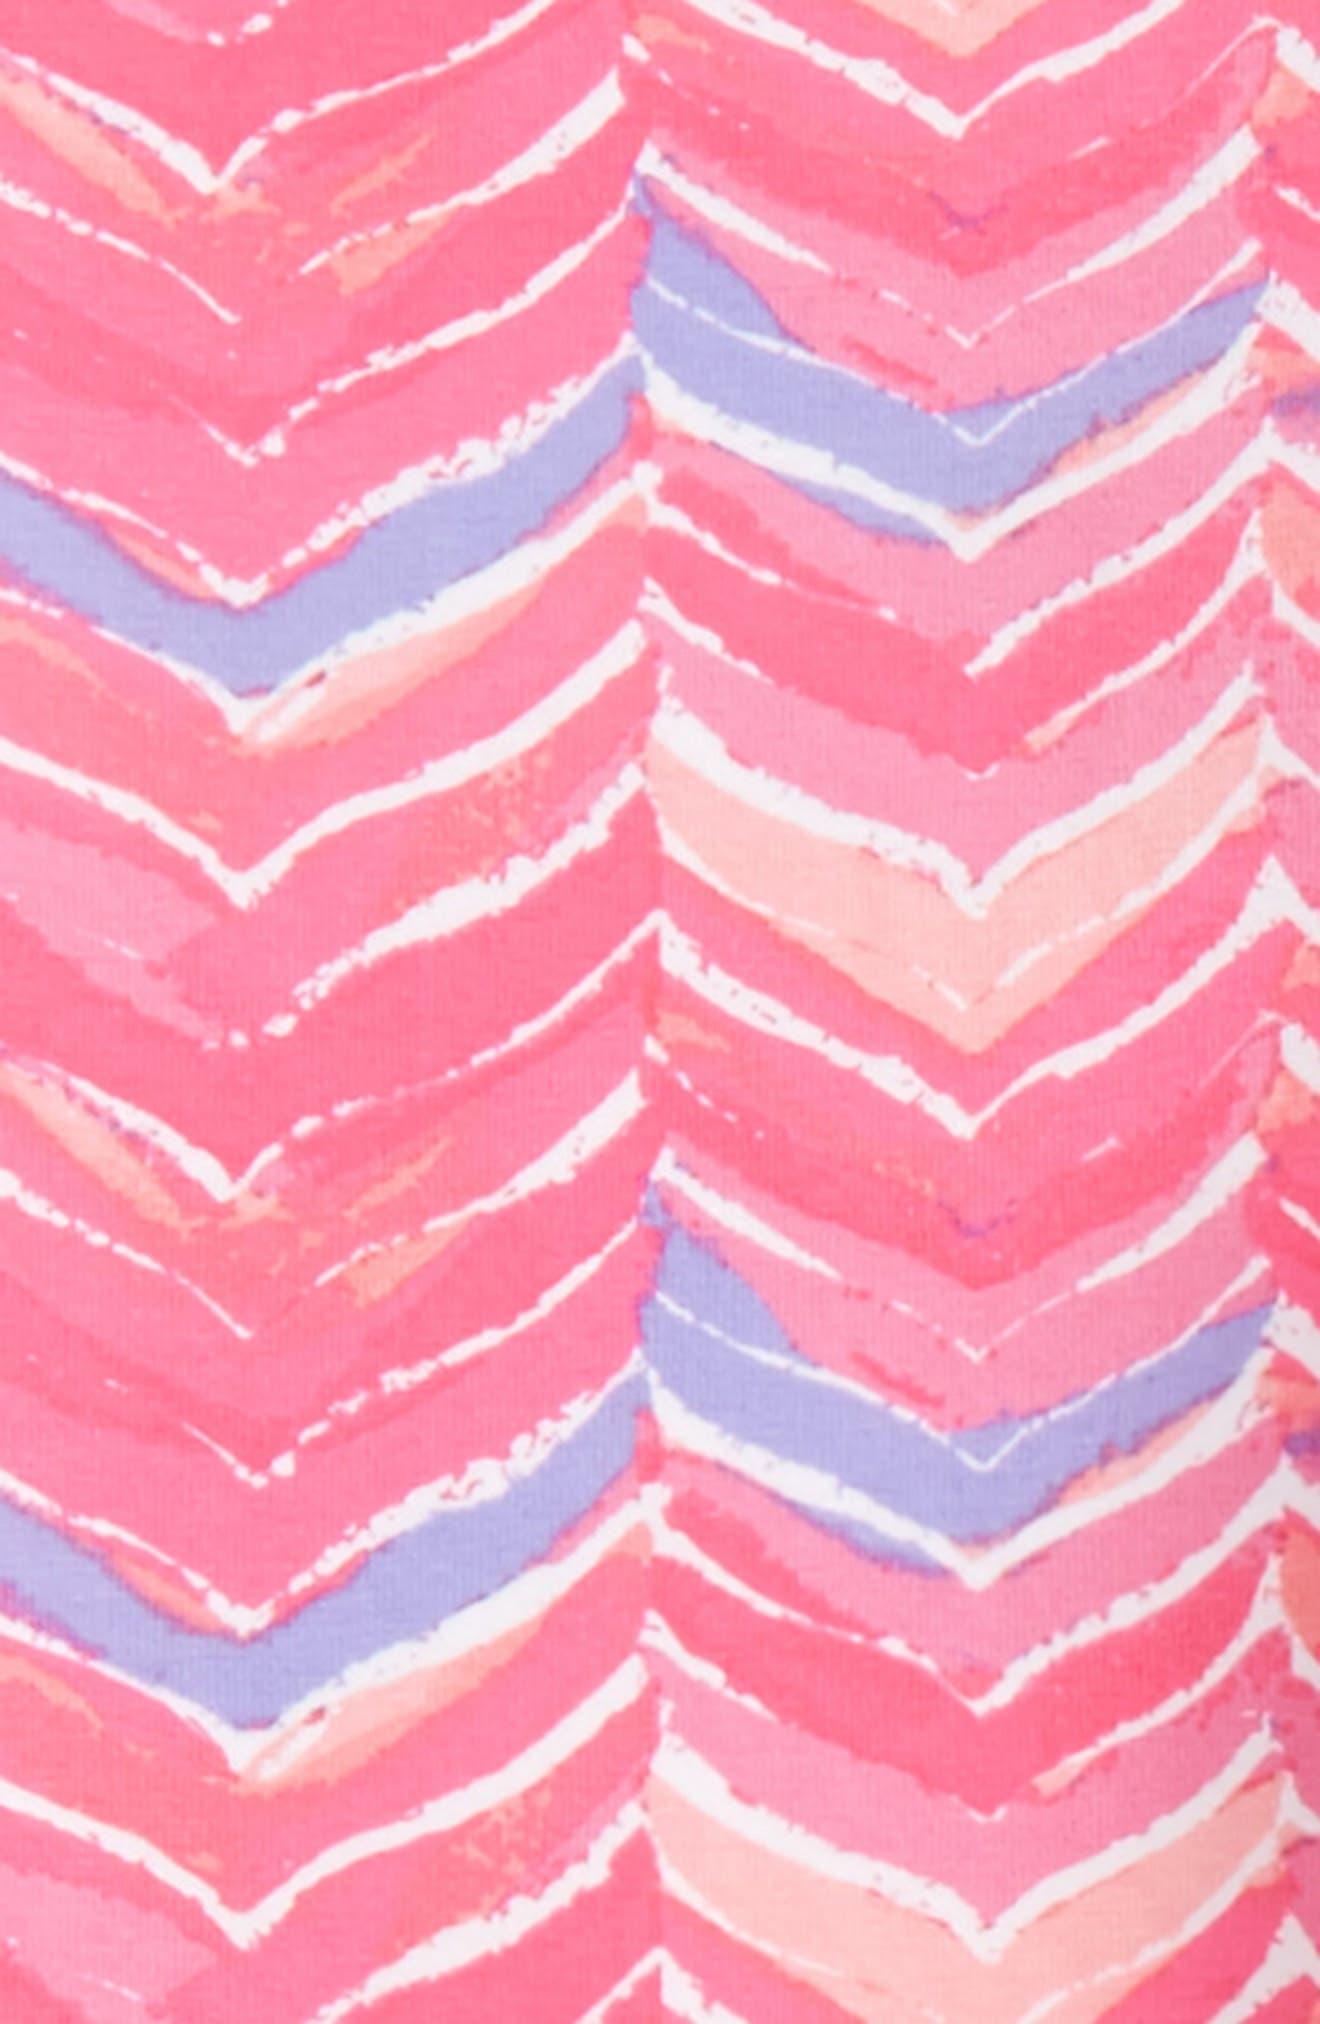 Whale Tail Knit Leggings,                             Alternate thumbnail 2, color,